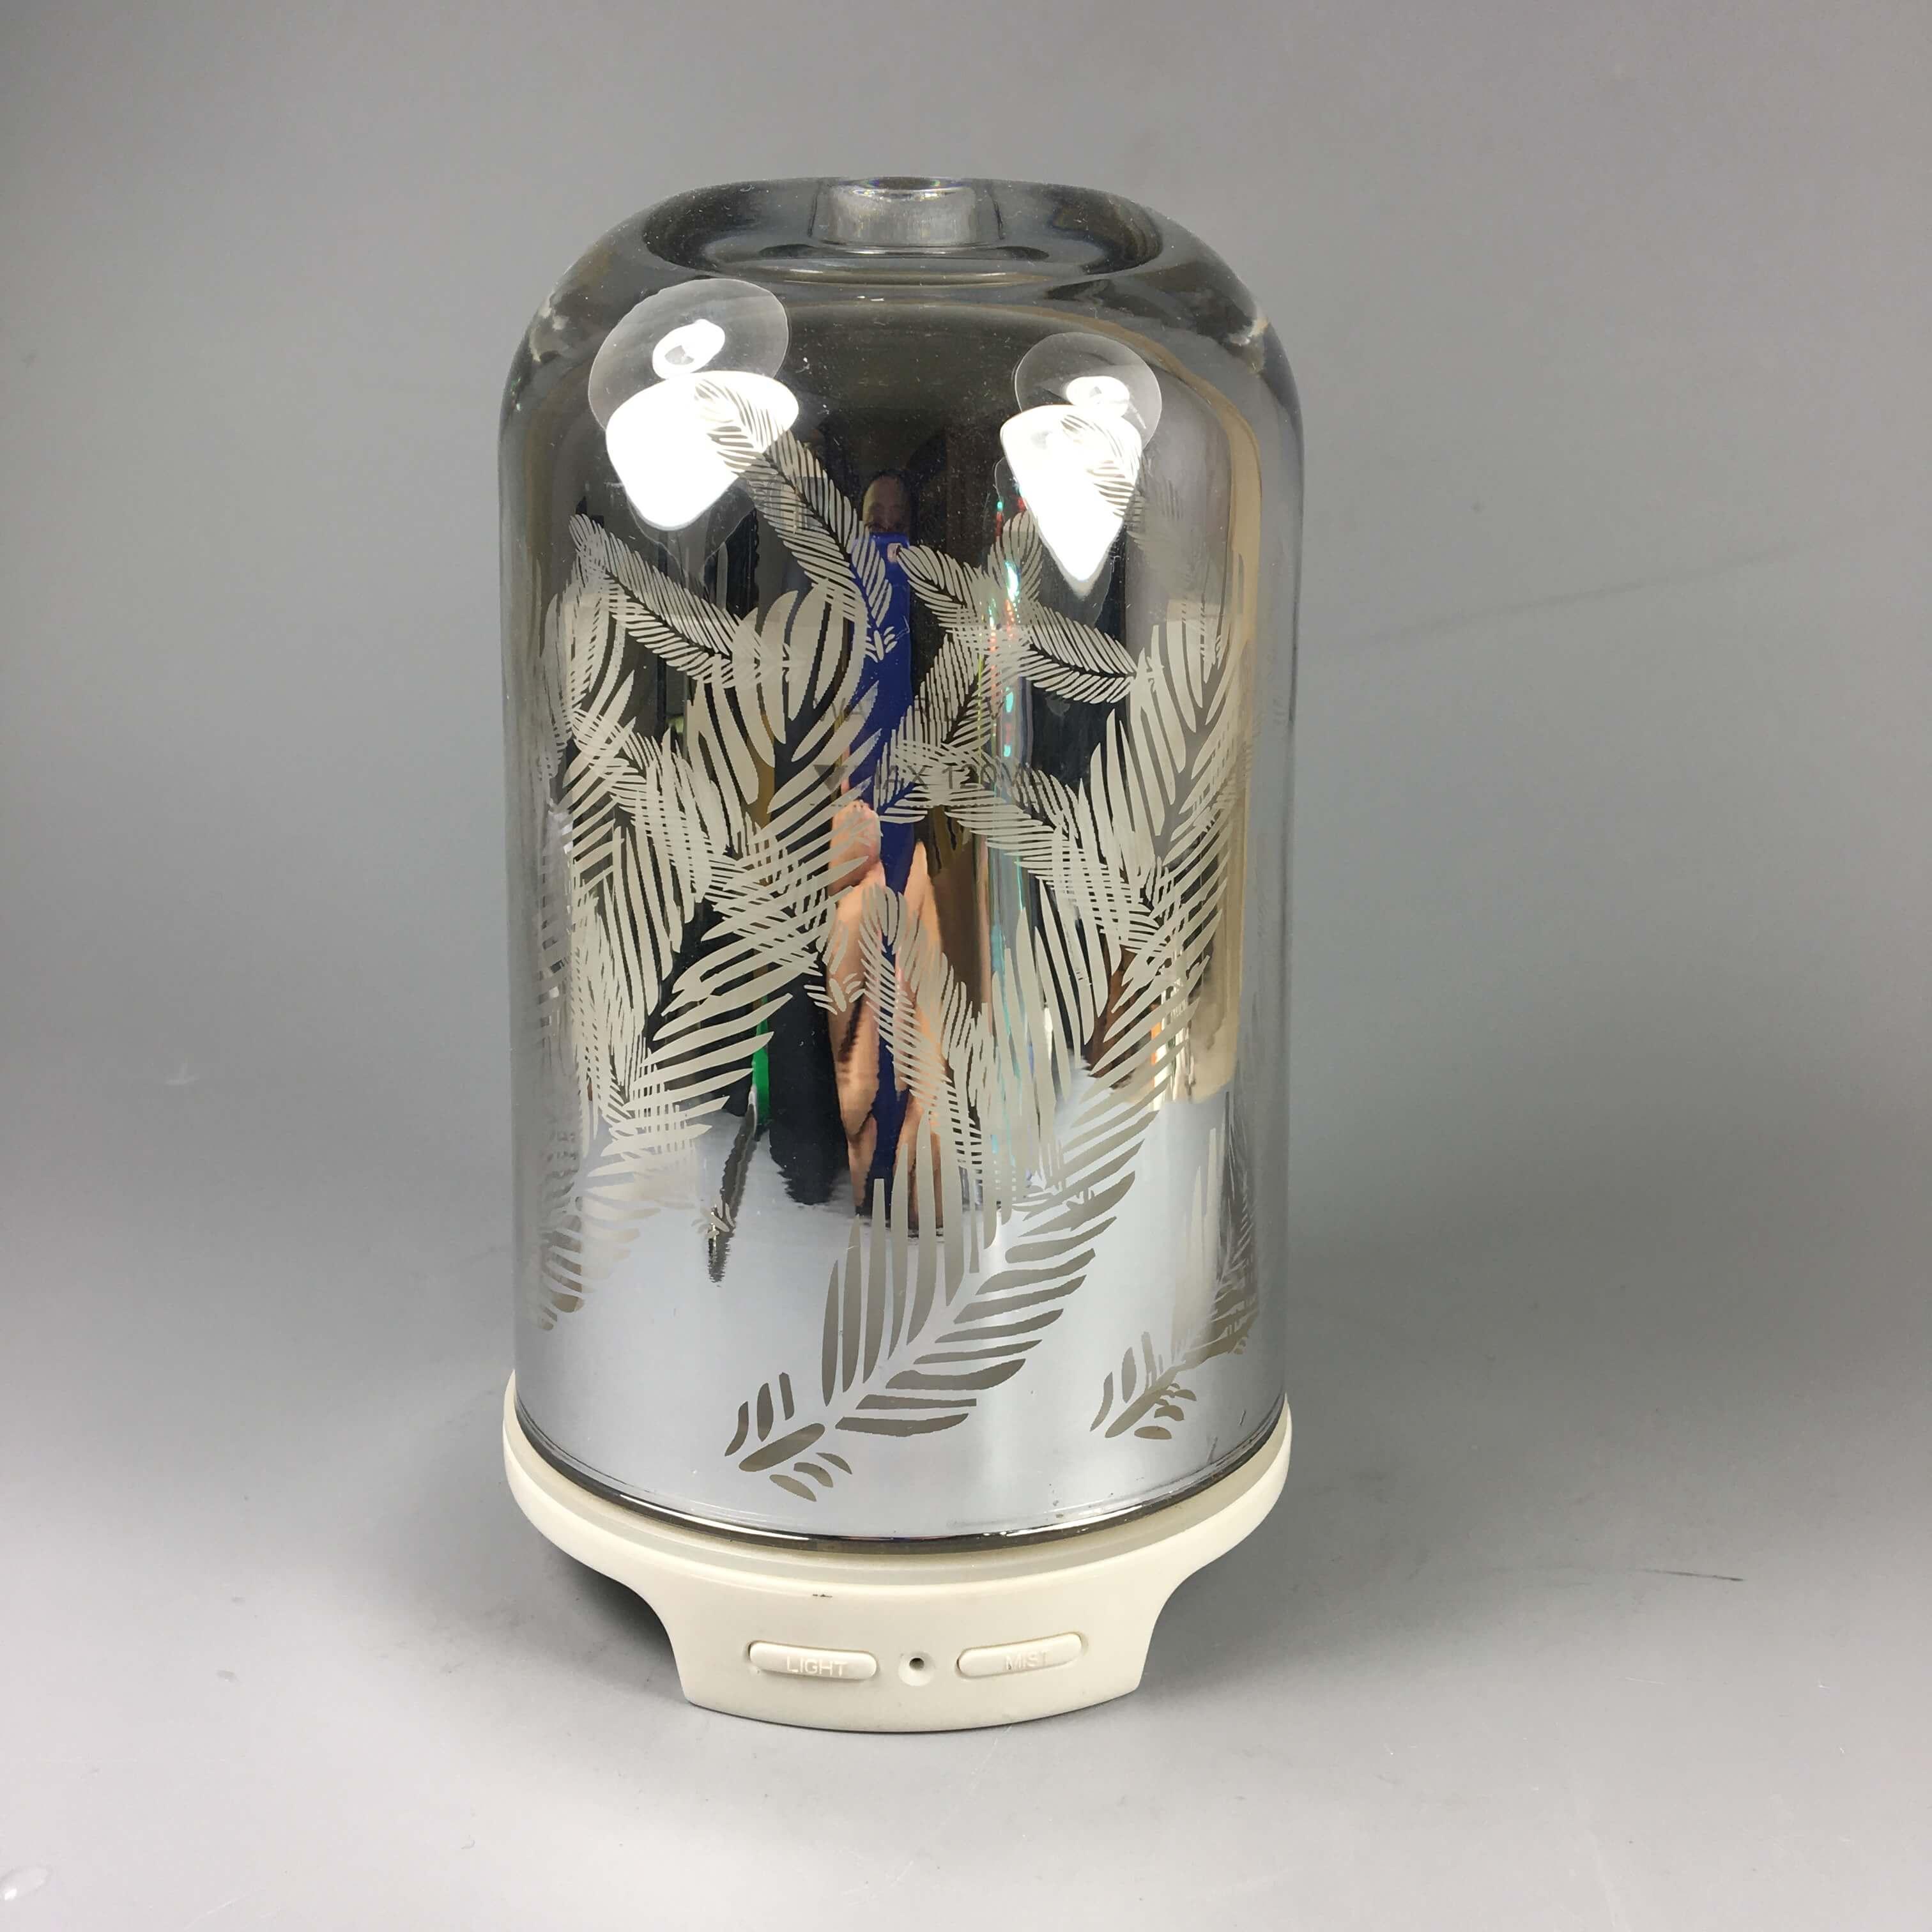 Electric-glass-aroma-diffuser-GEA180934